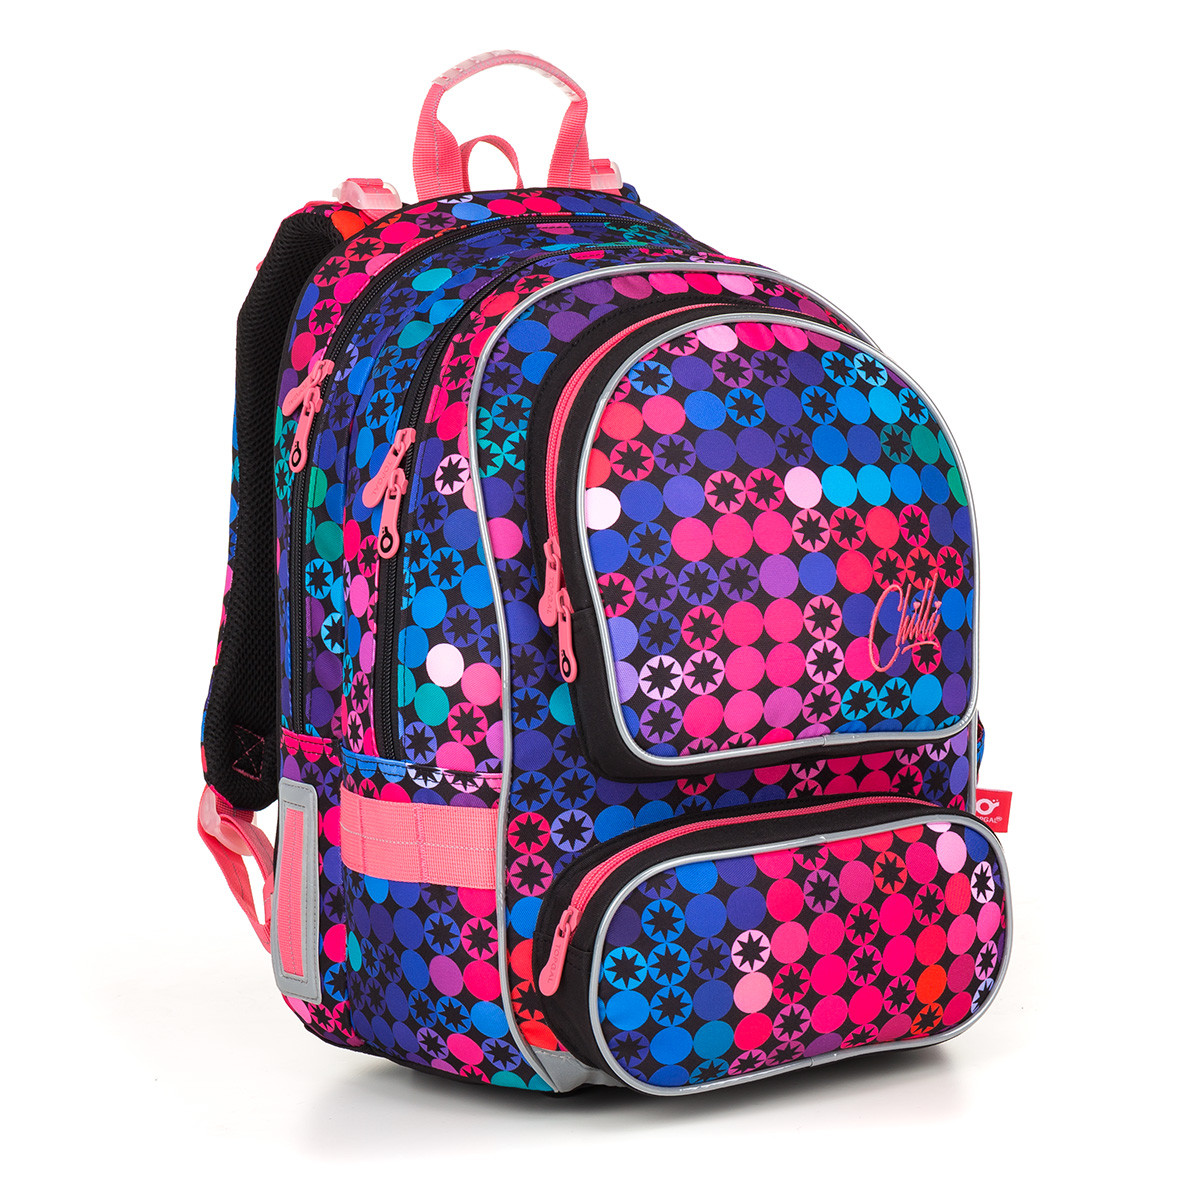 21d6eff653a Školní batoh Topgal - ALLY 18012 G